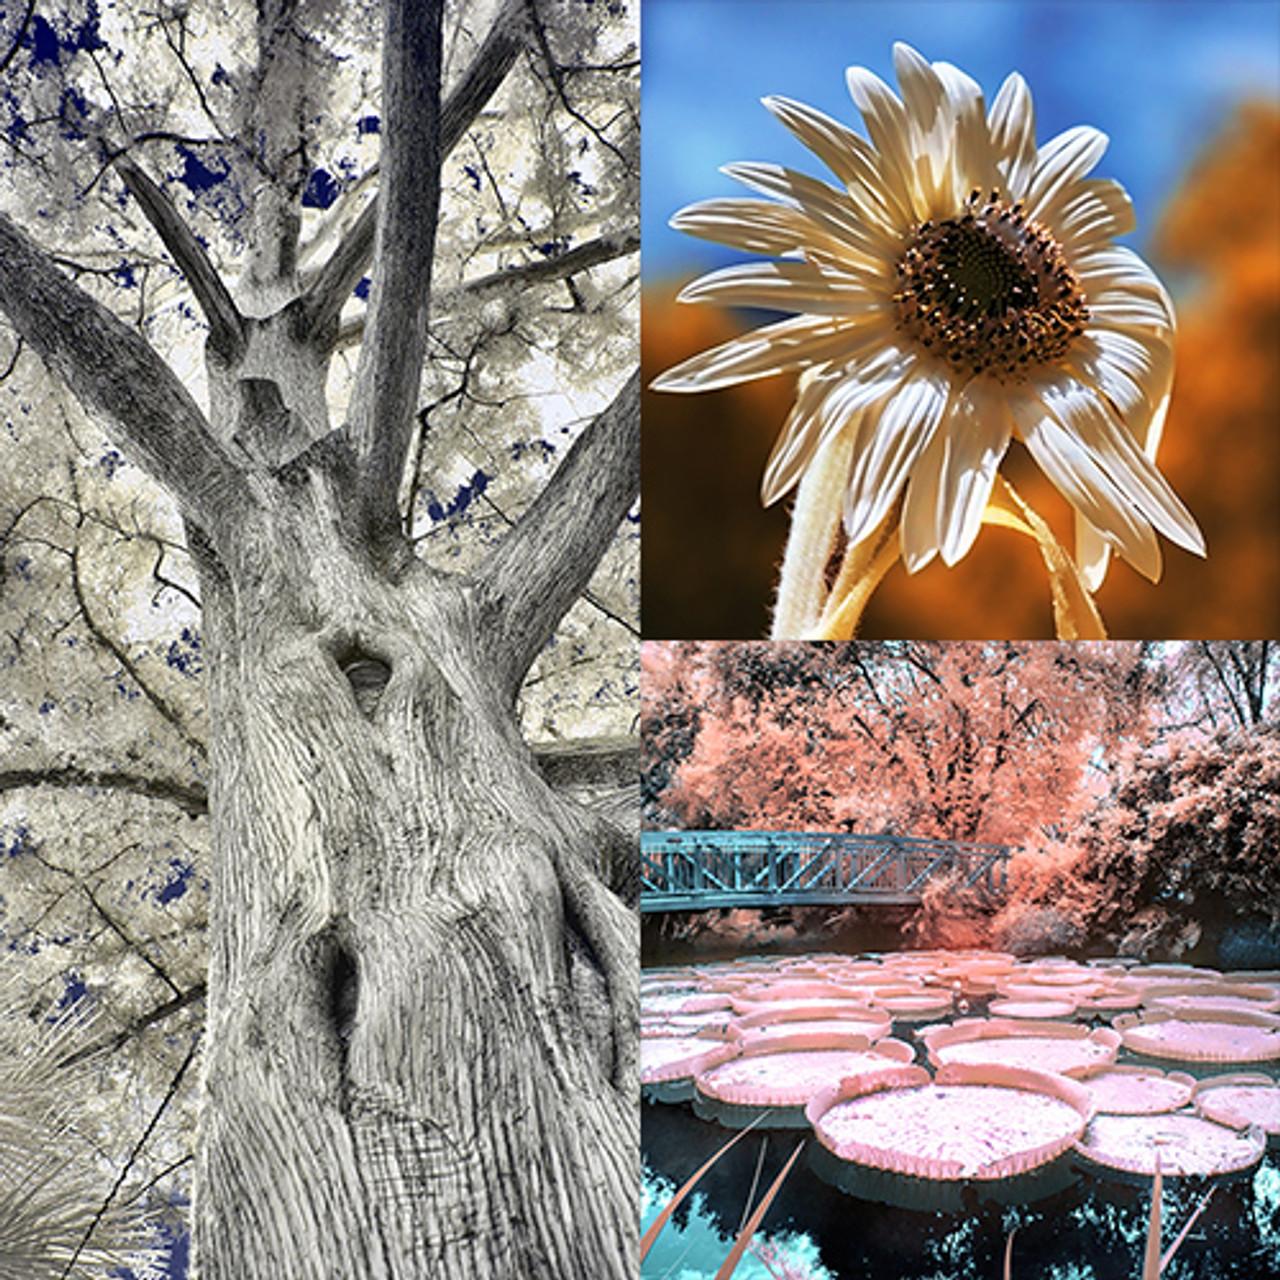 Flowers • Plants • Trees